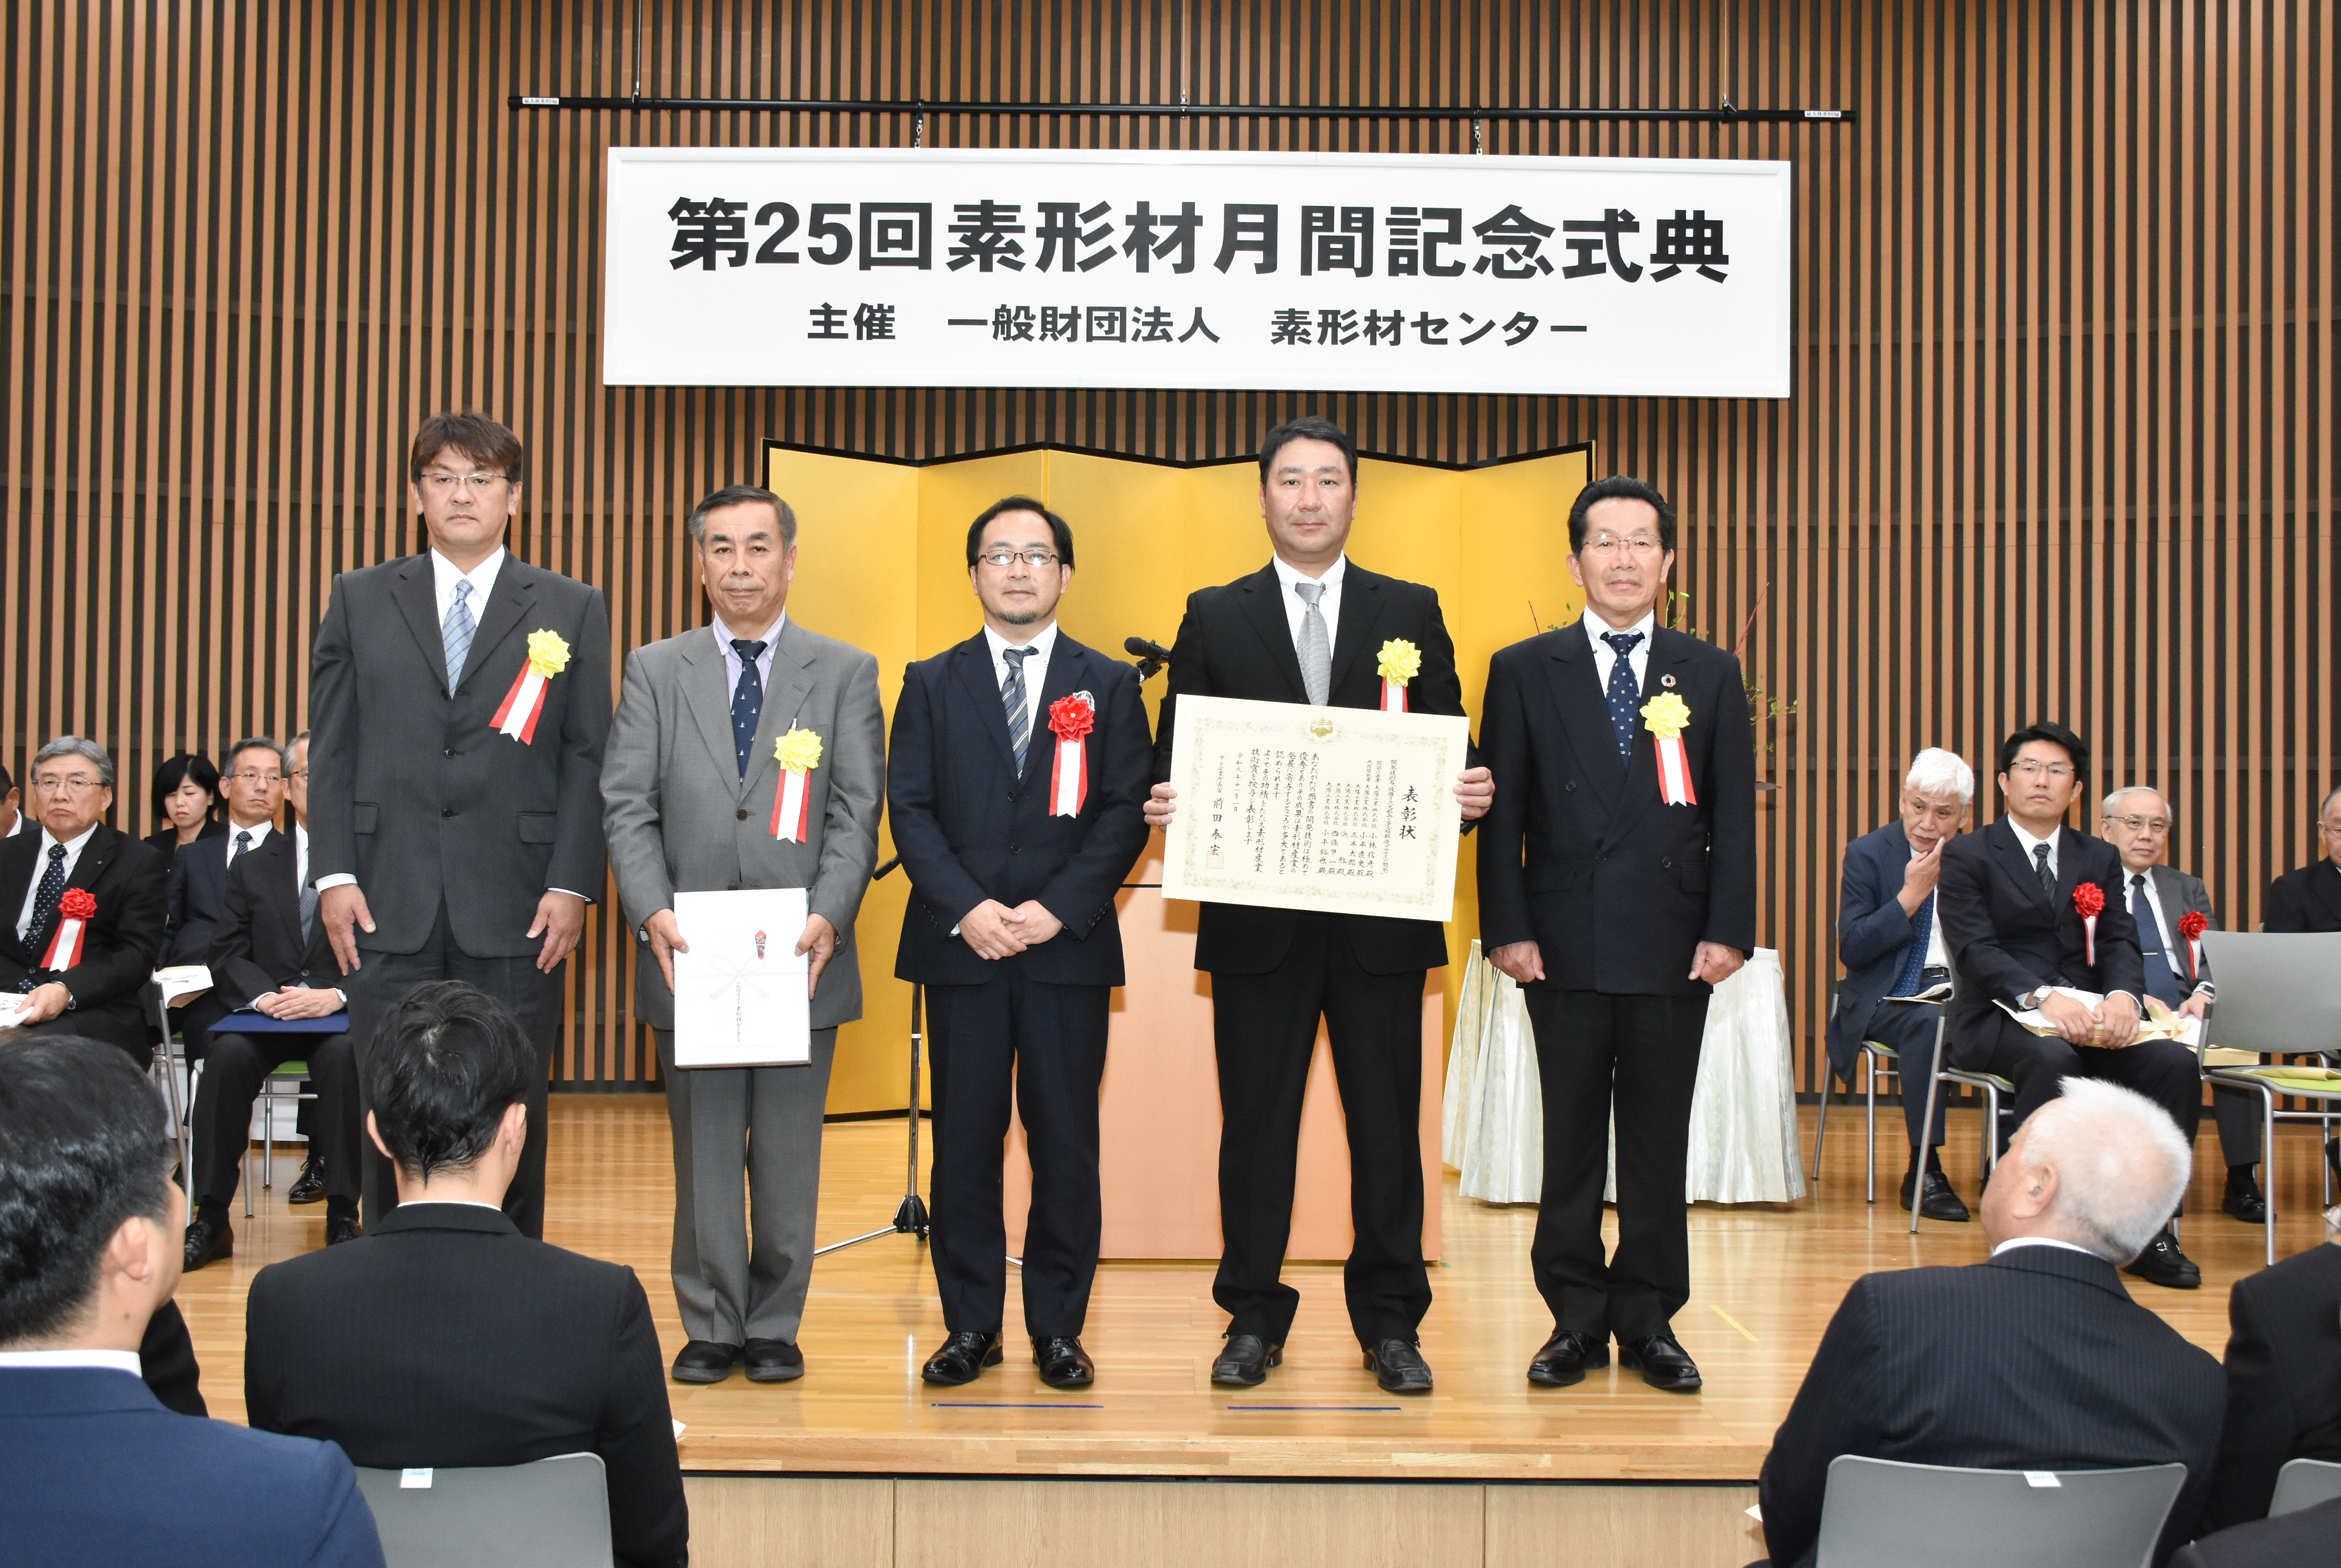 中小企業庁長官賞表彰の画像